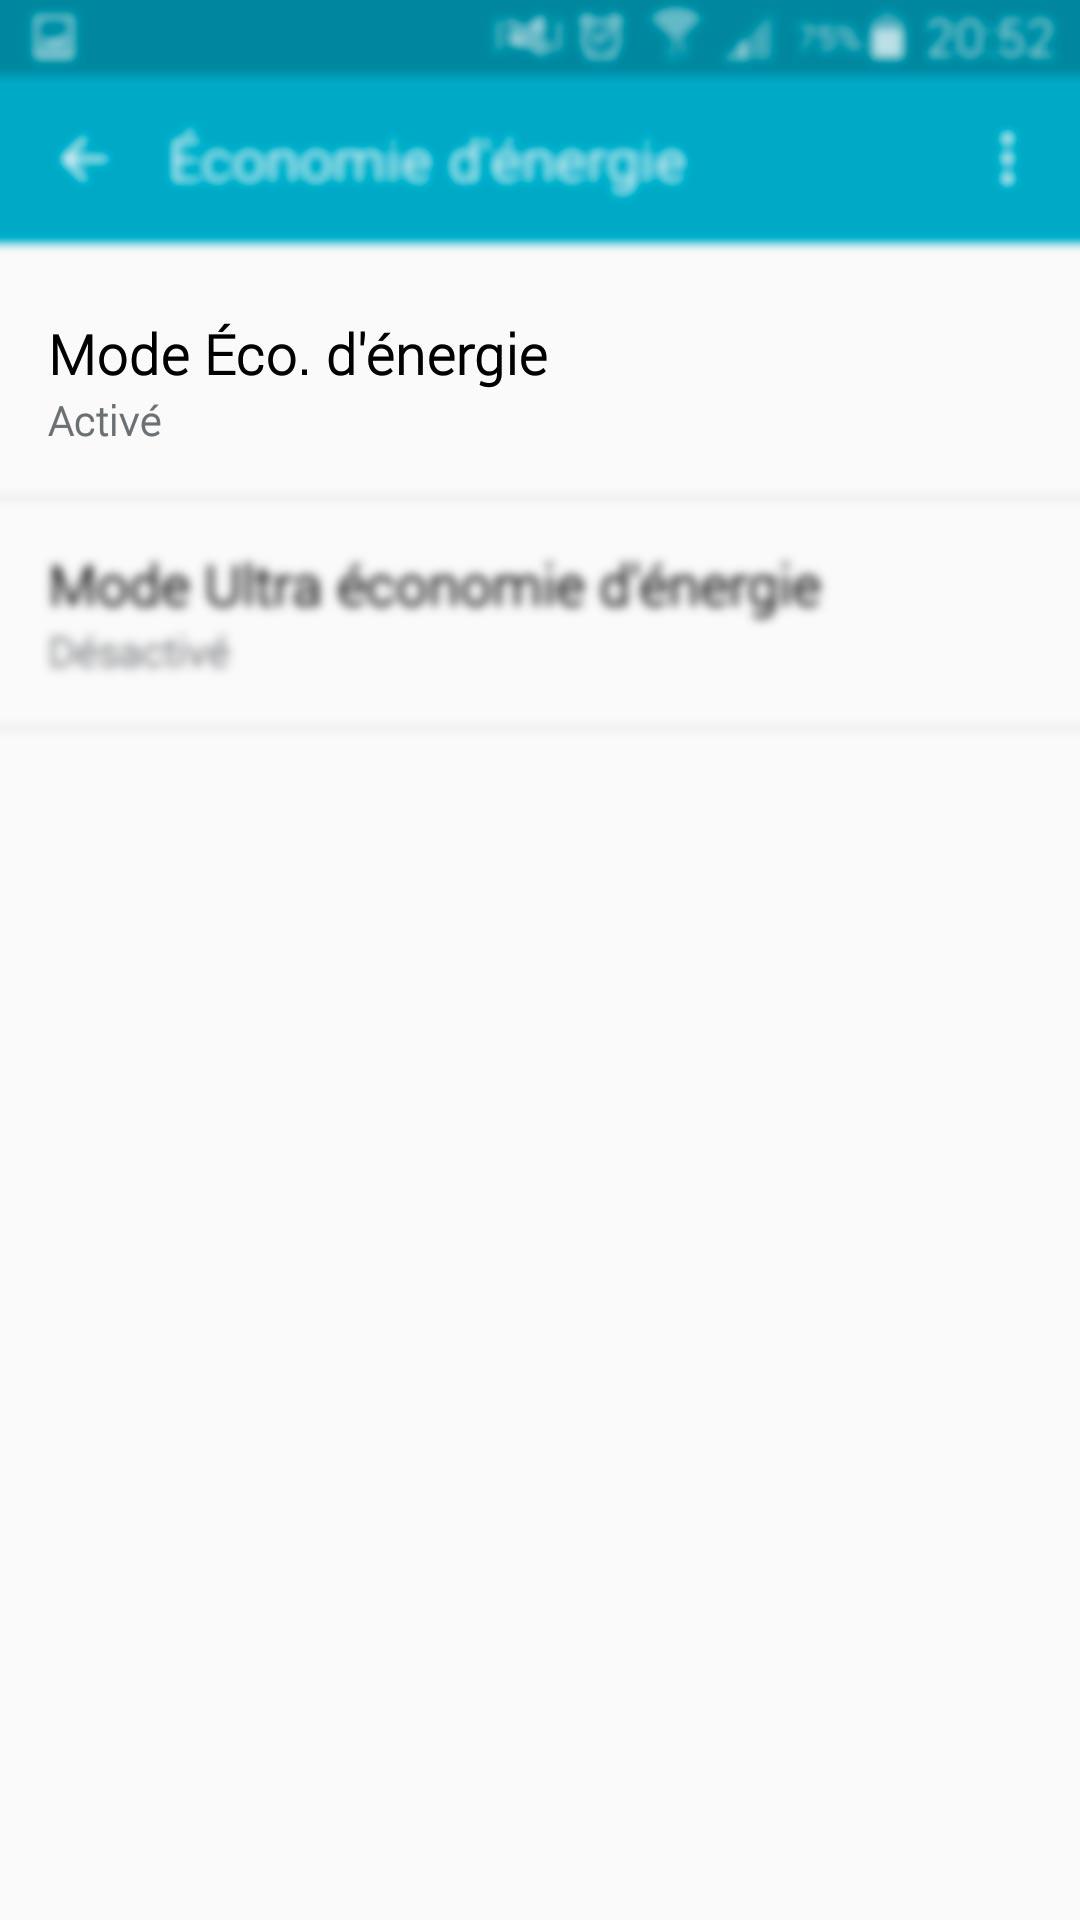 Mode Eco d'énergie